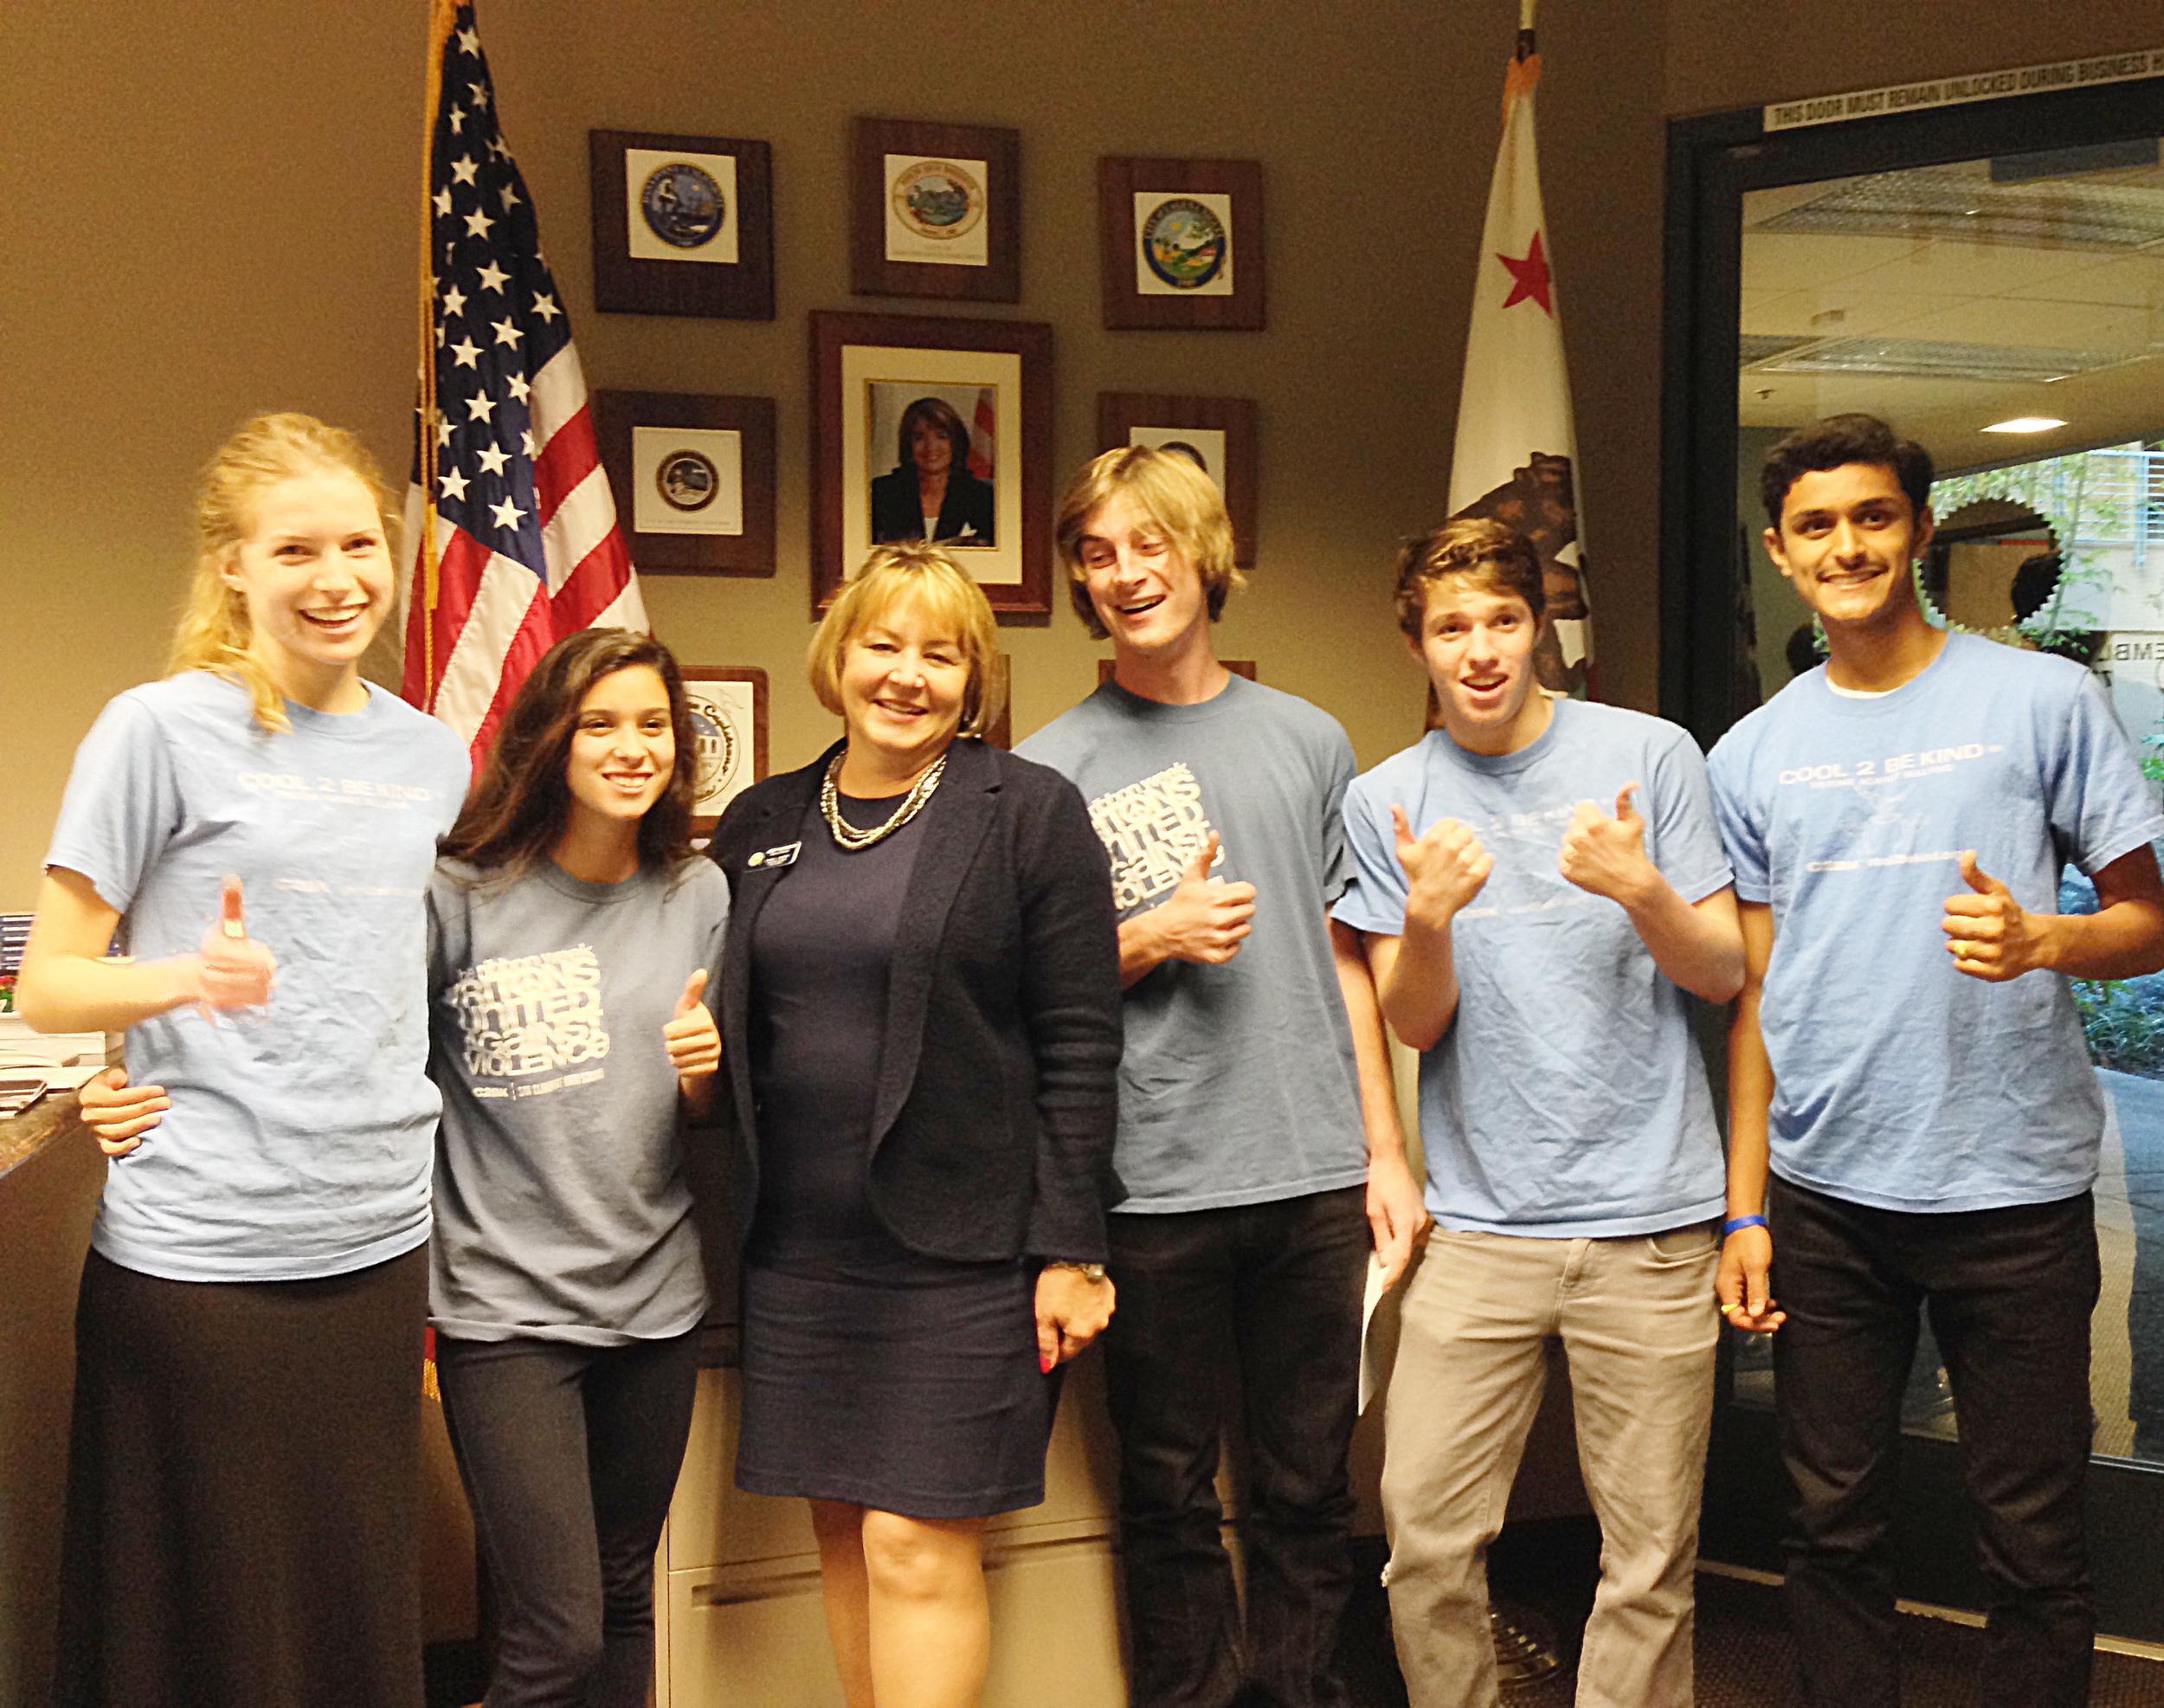 Assemblywoman meeting copy.jpg